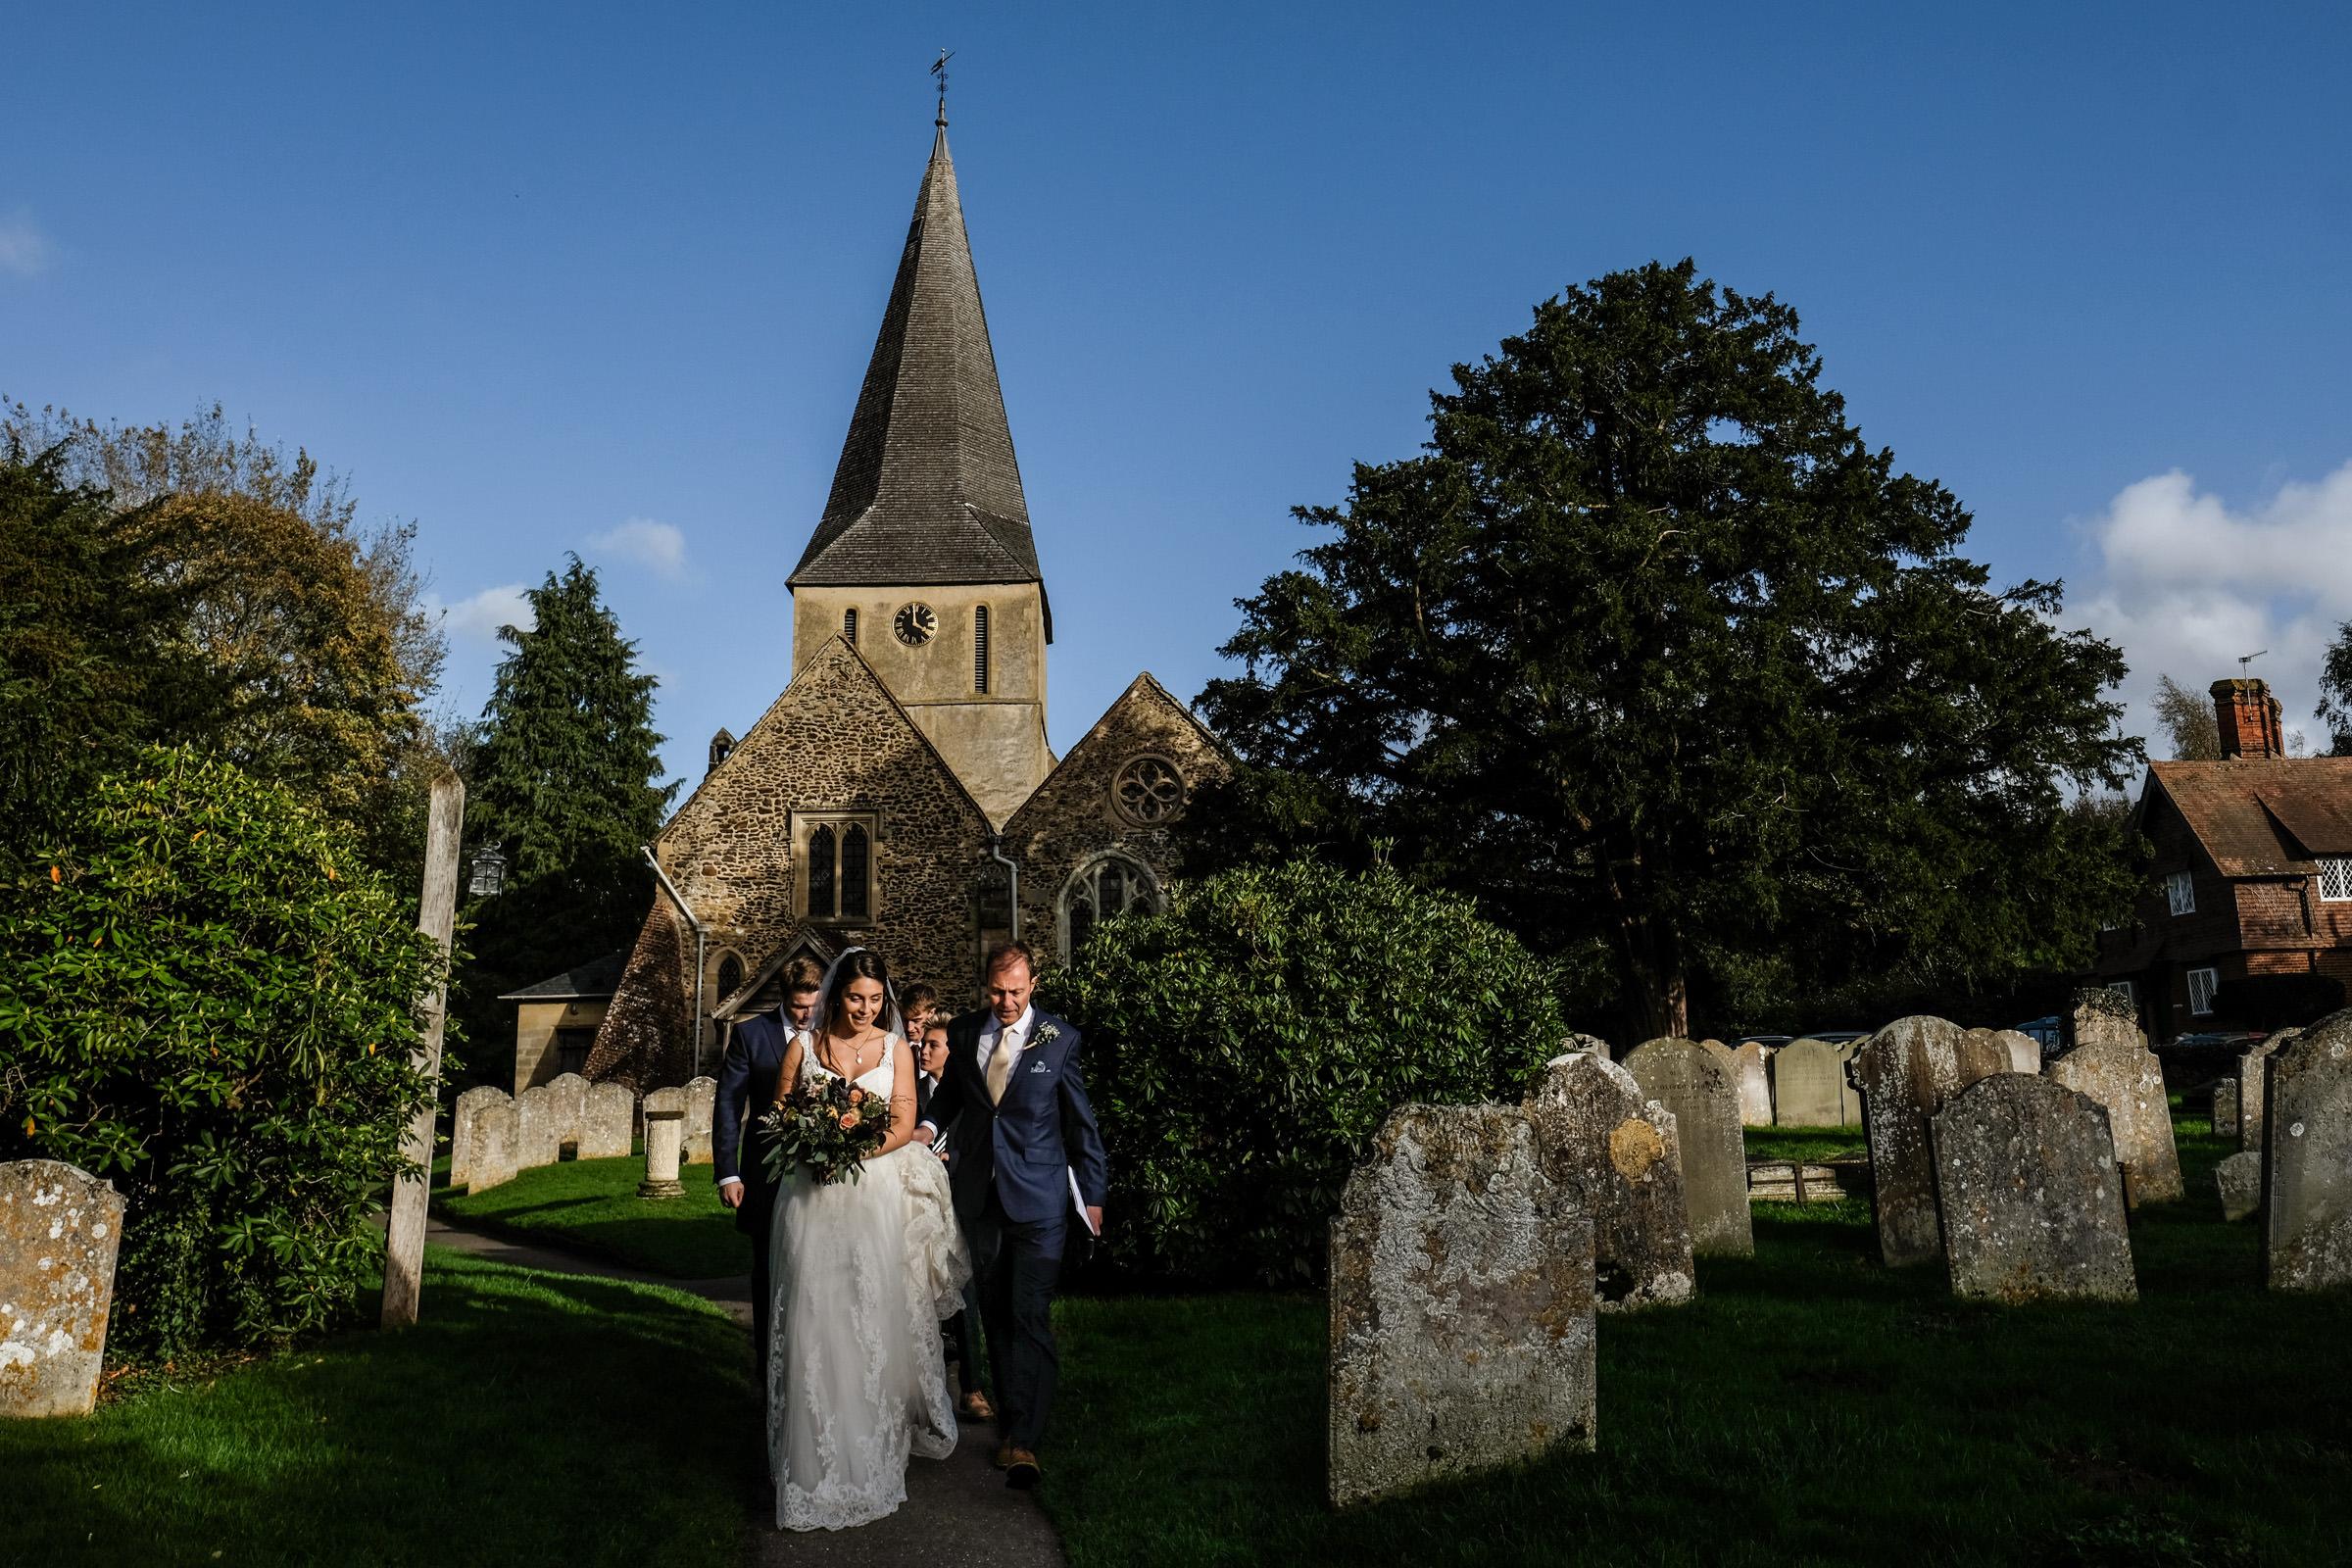 Talbot+Inn+Wedding+Photos+Surrey+023.jpg